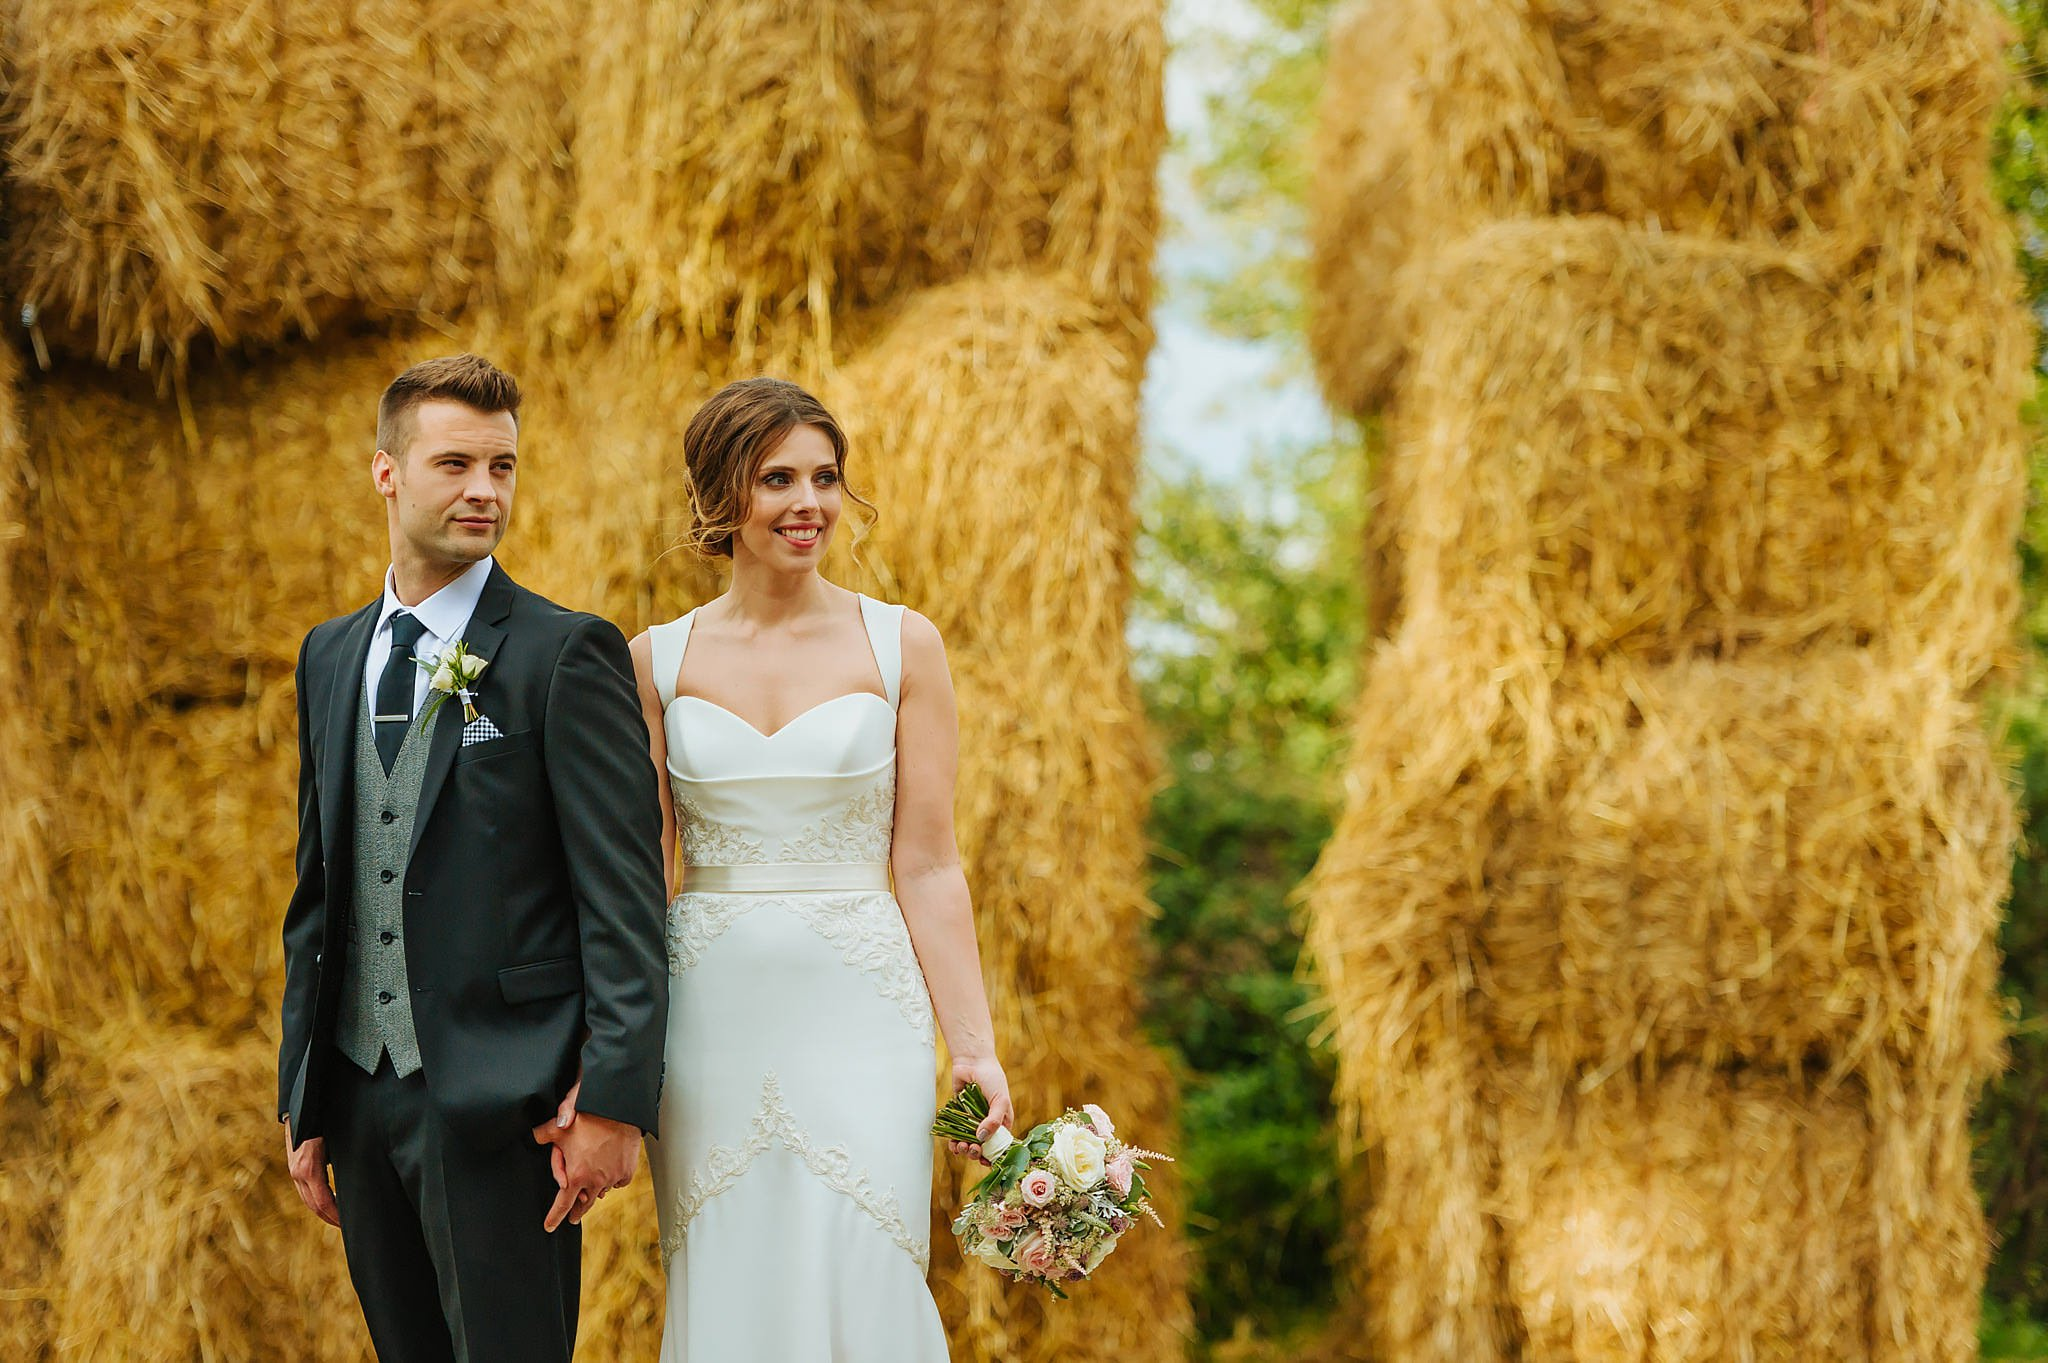 stone-barn-wedding-cotswolds (81)